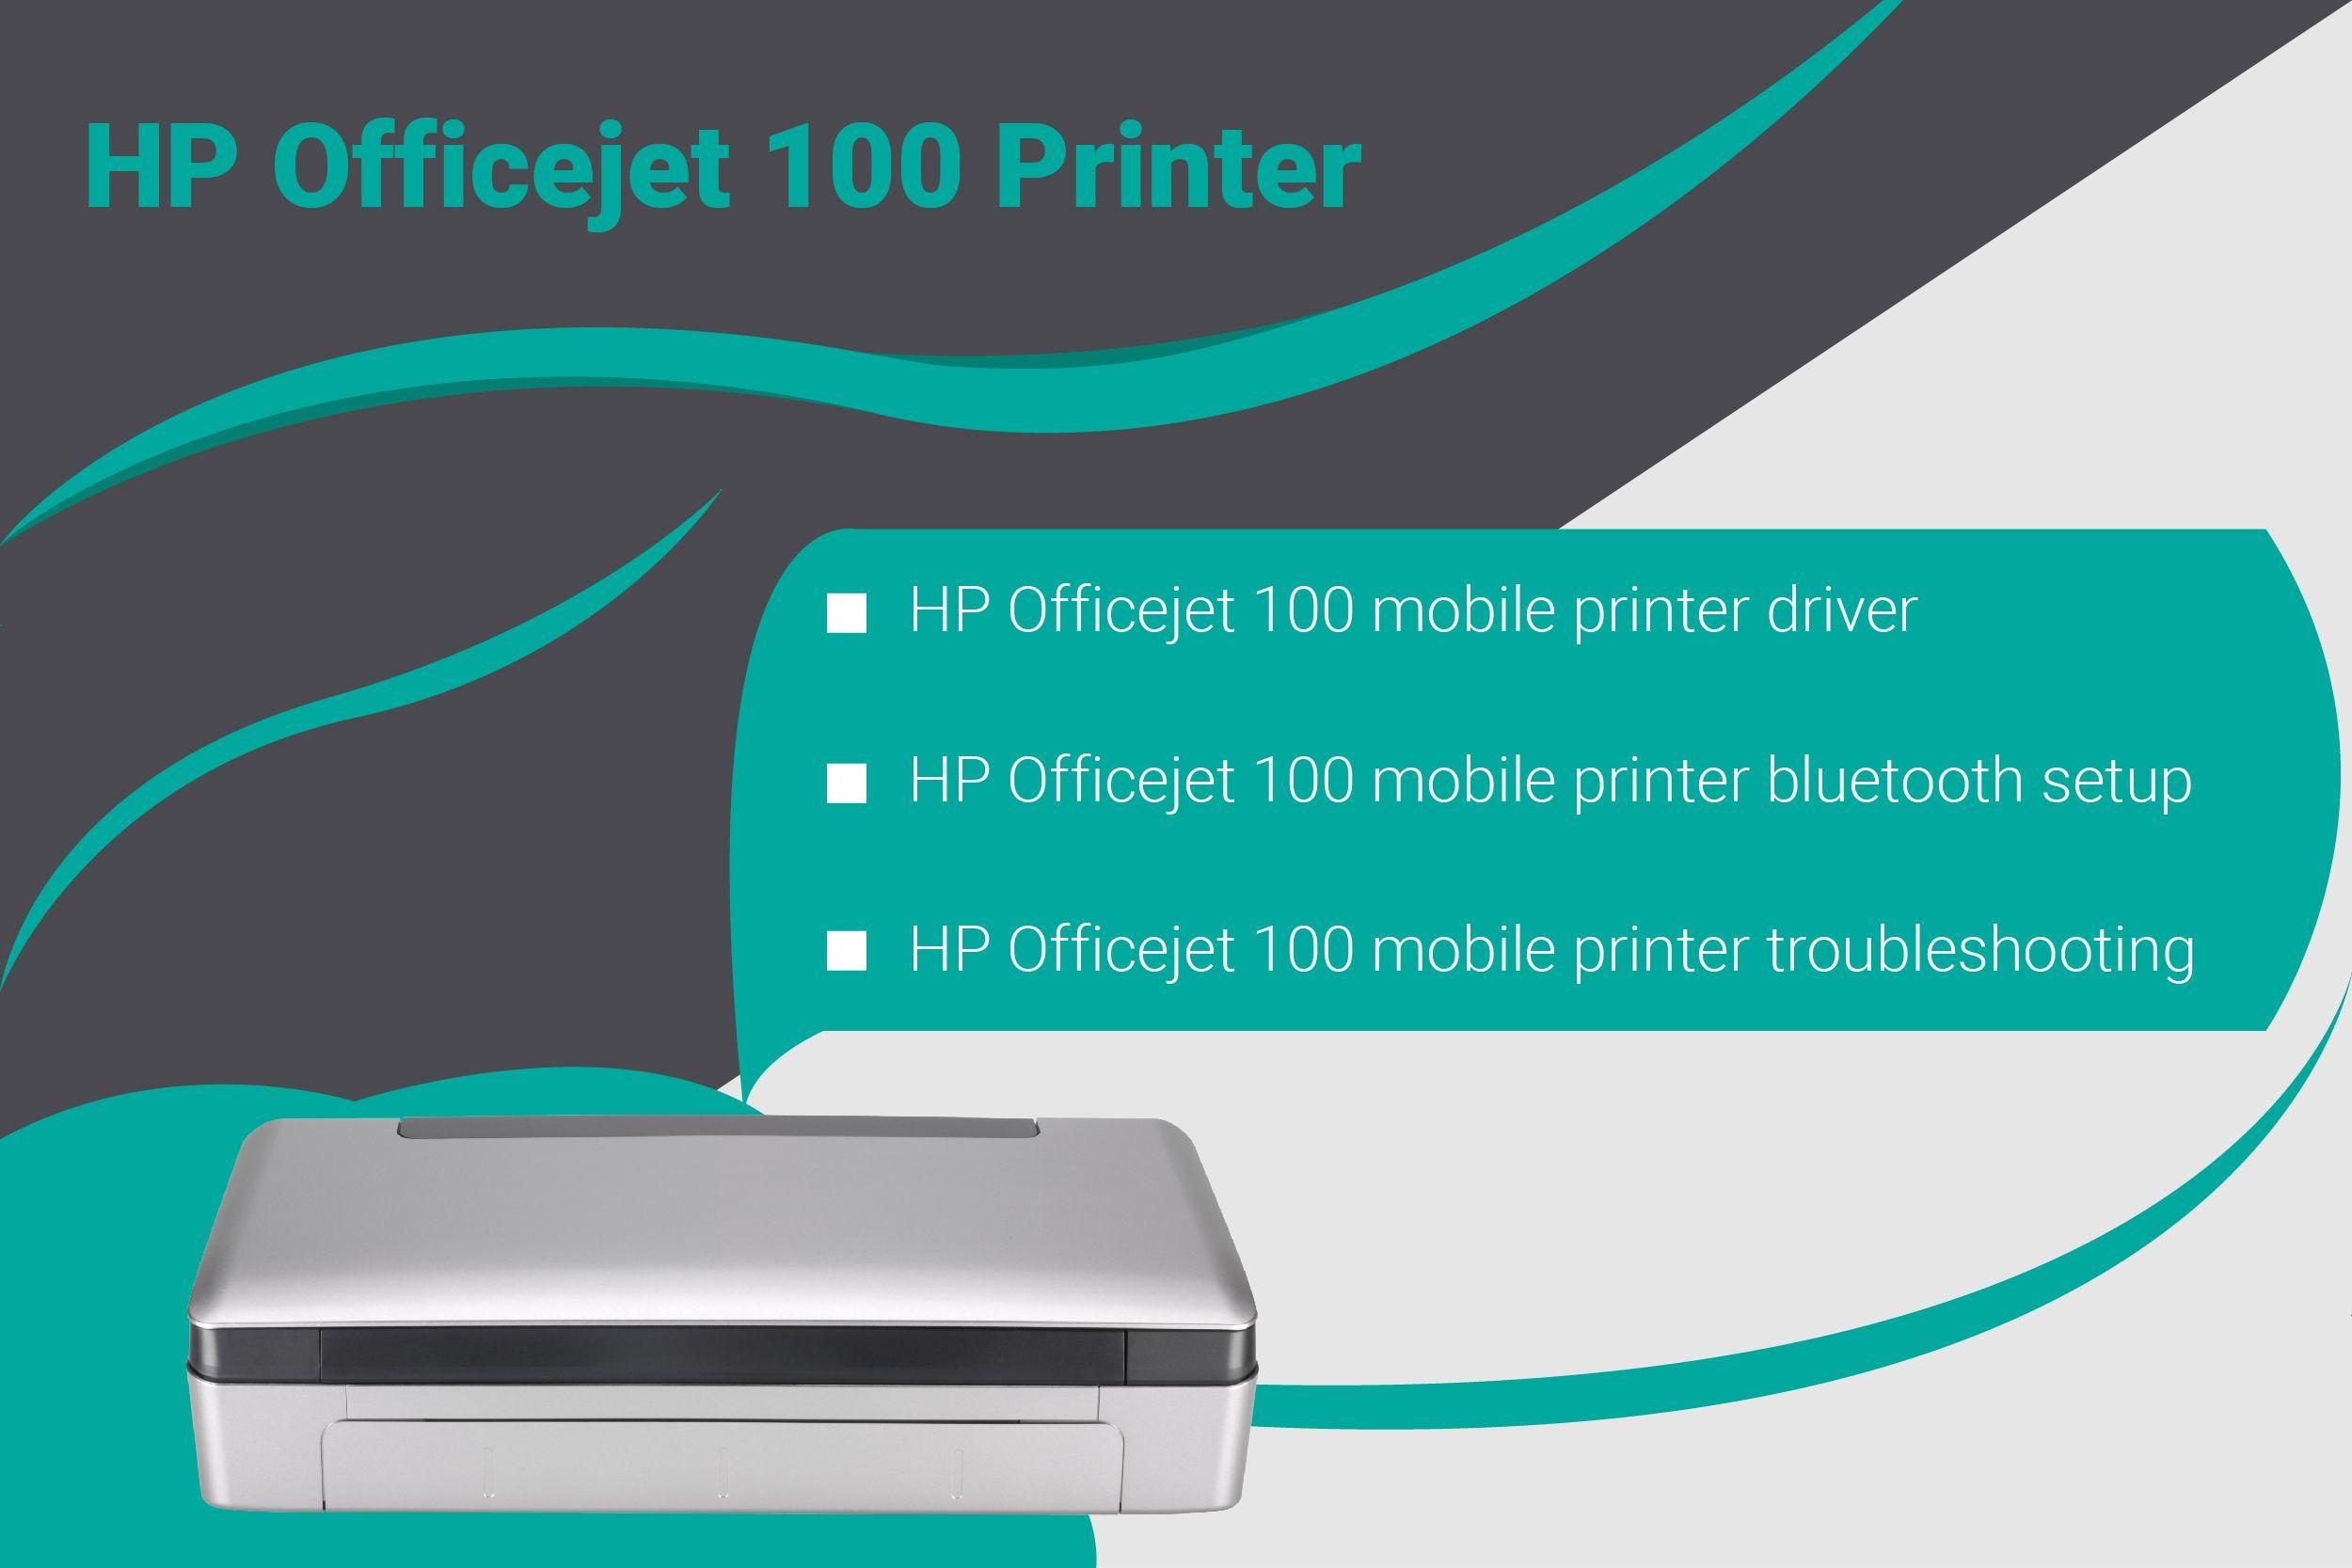 Hp Oficejet 100 Mobile Printer Bluetooth Setup Mobile Printer Wireless Printer Mobile Print